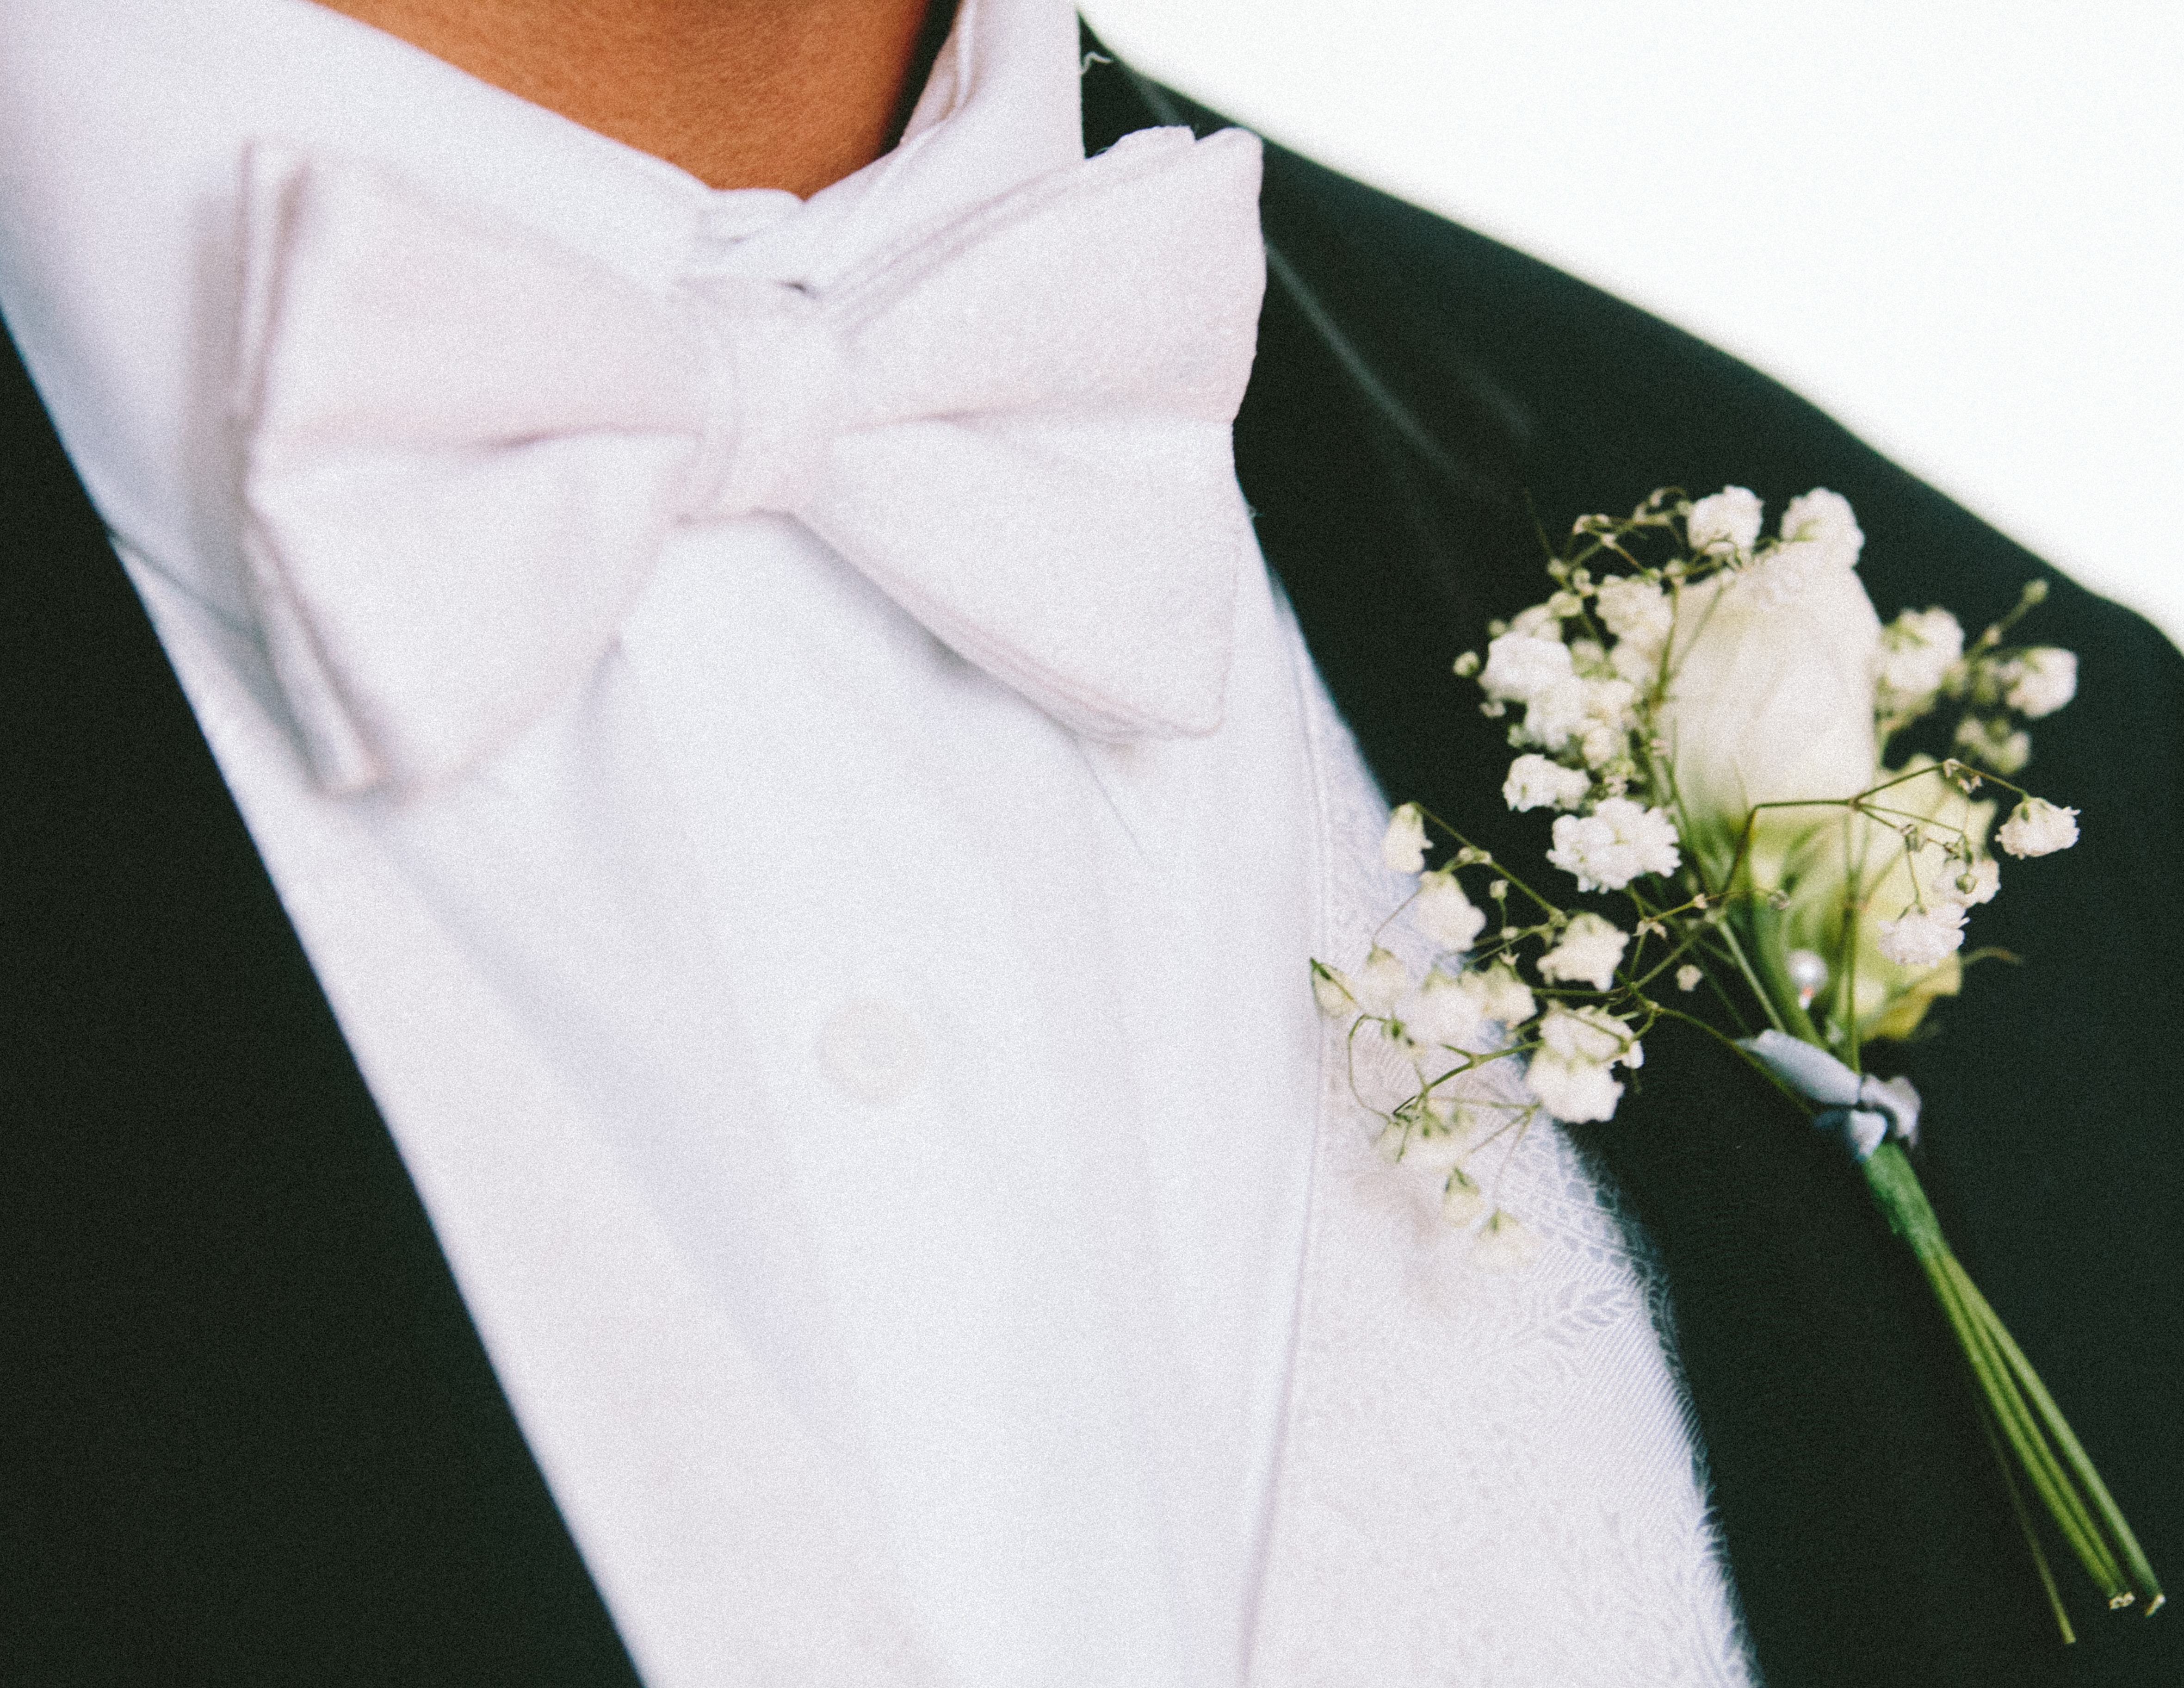 Groom - White Tie